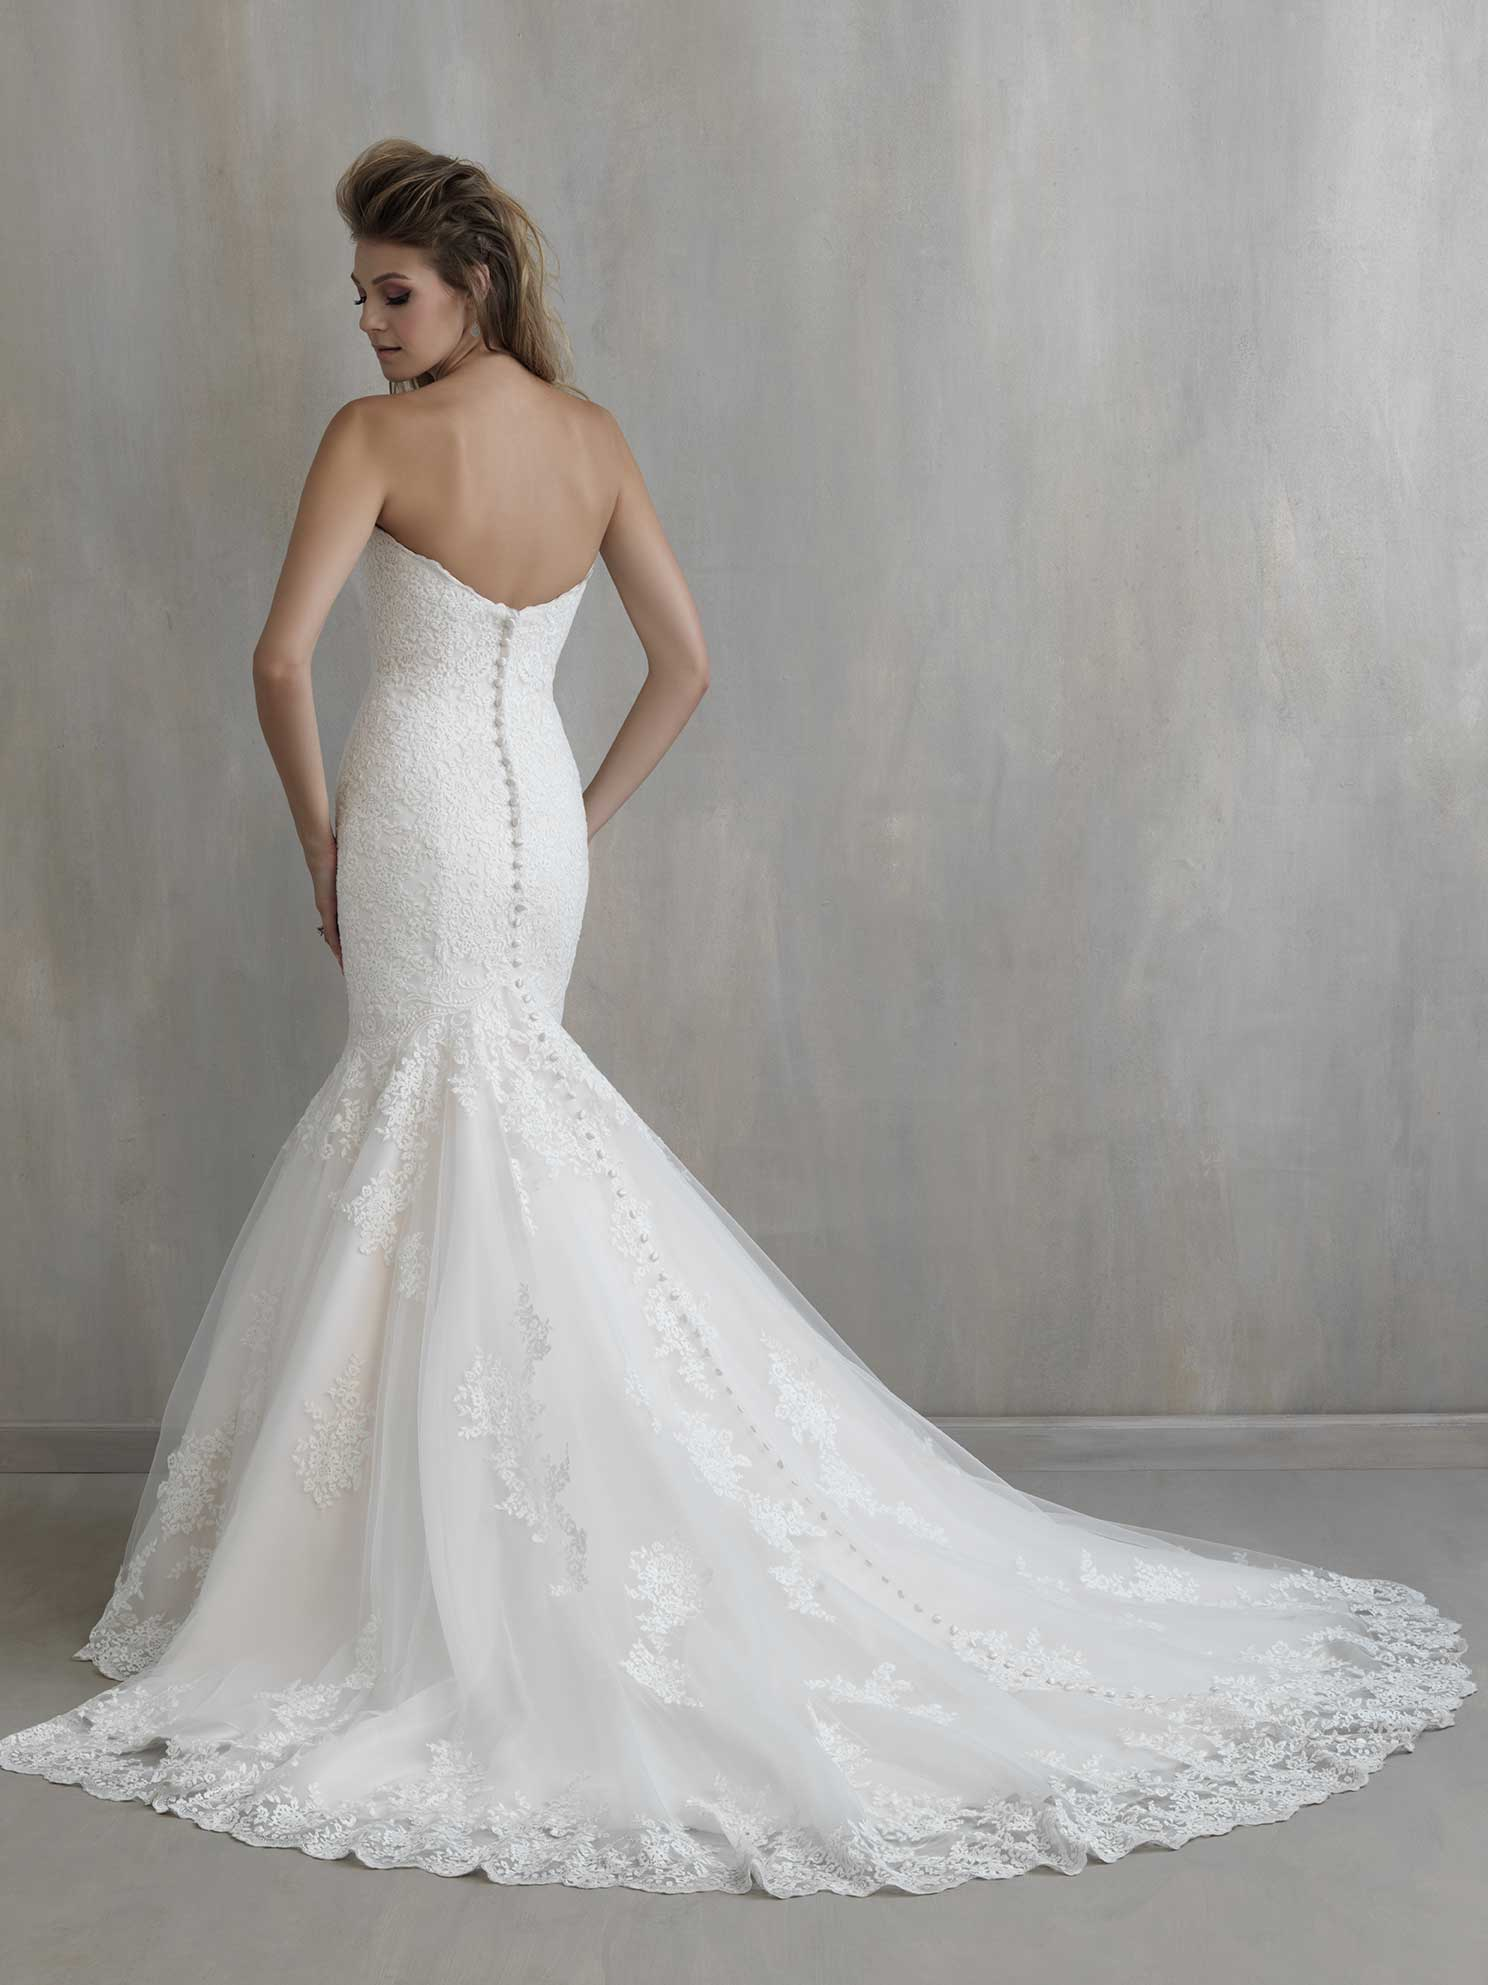 Sweetheart Neck Lace Mermaid Wedding Dress | Kleinfeld Bridal